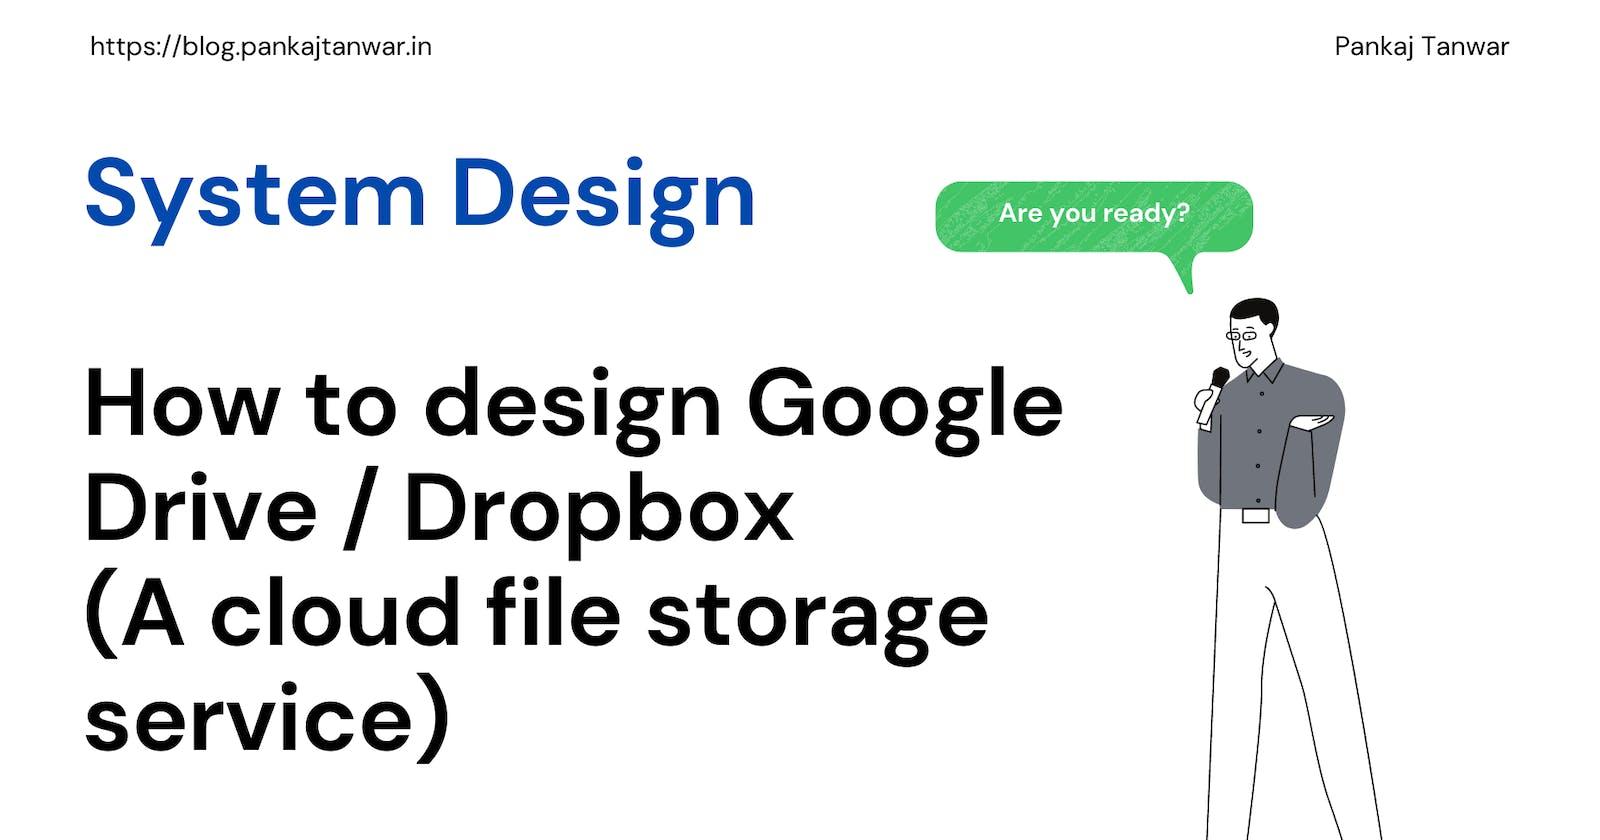 System Design - How to design Google Drive / Dropbox (a cloud file storage service)